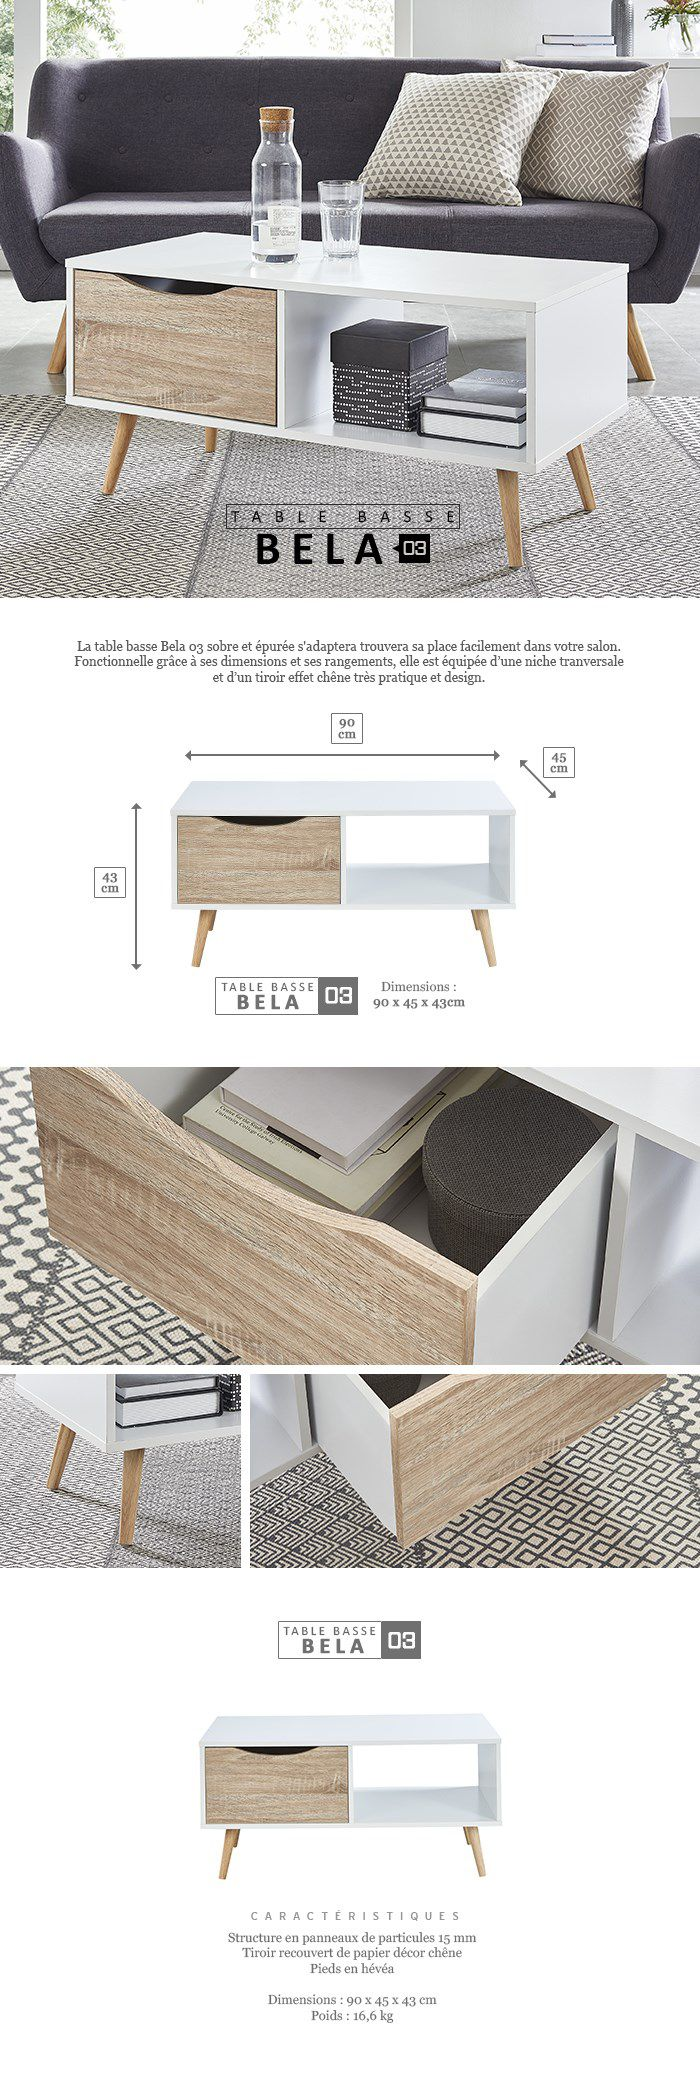 BELA Table basse scandinave blanc et chêne - L 90 cm